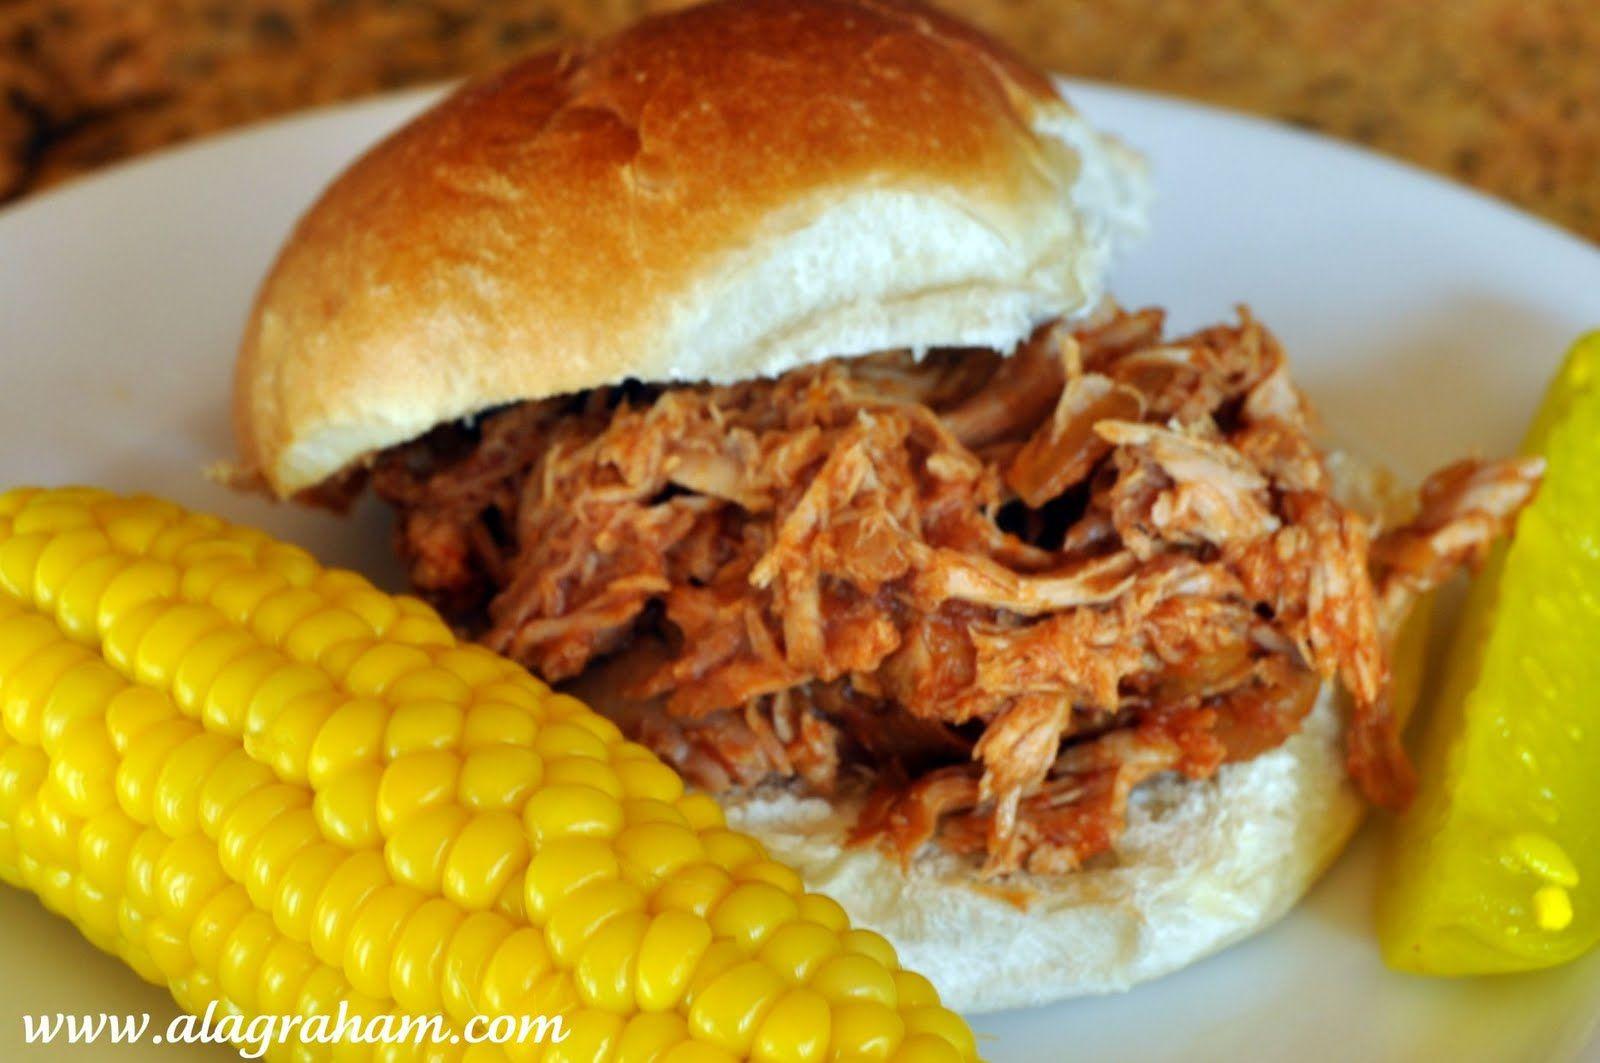 BBQ pork sandwich. | Food | Pinterest